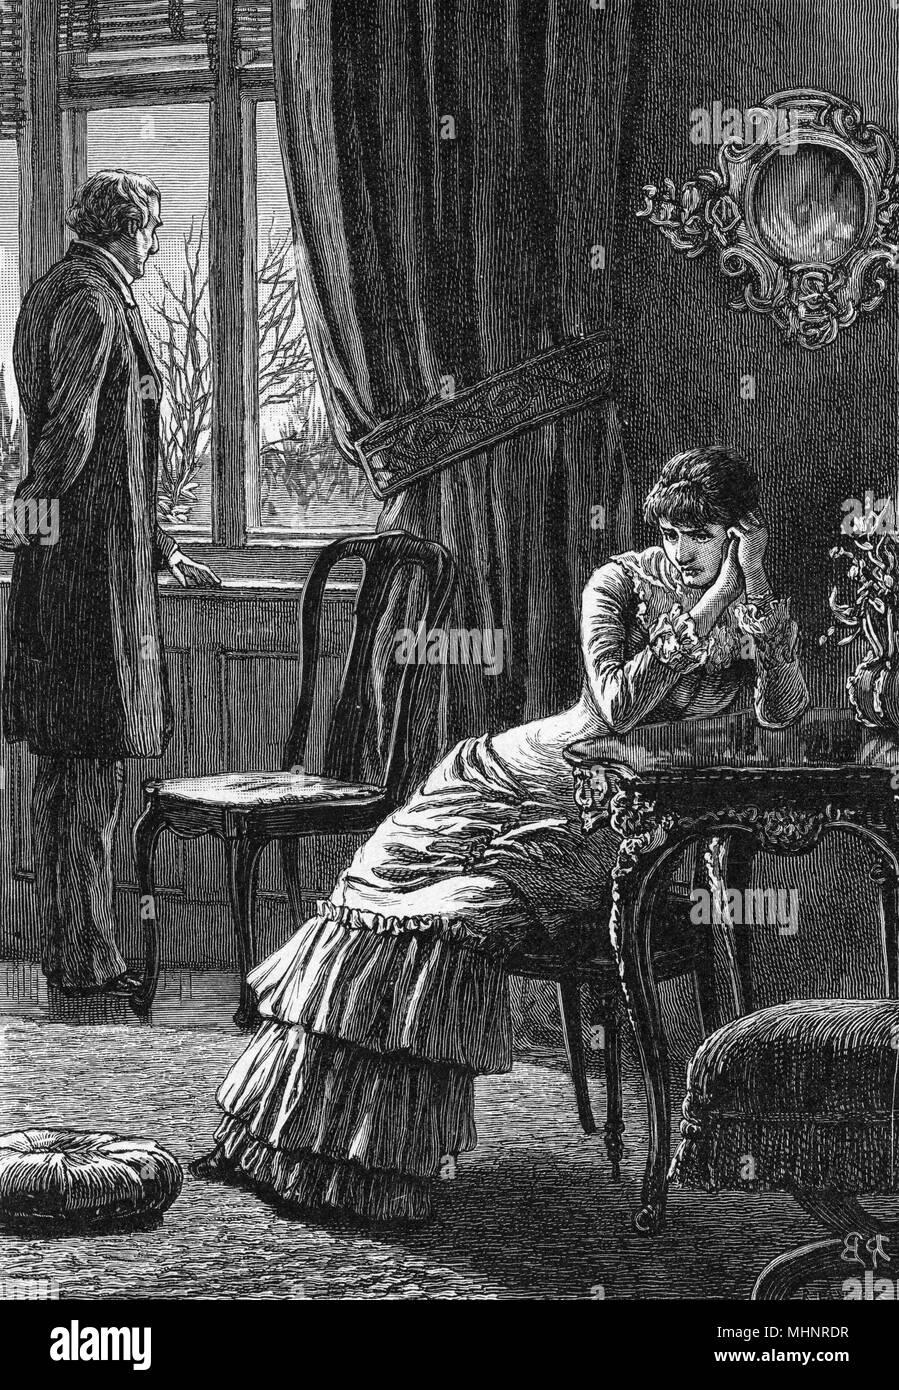 Tensa escena nacional Fecha: c.1880 Imagen De Stock